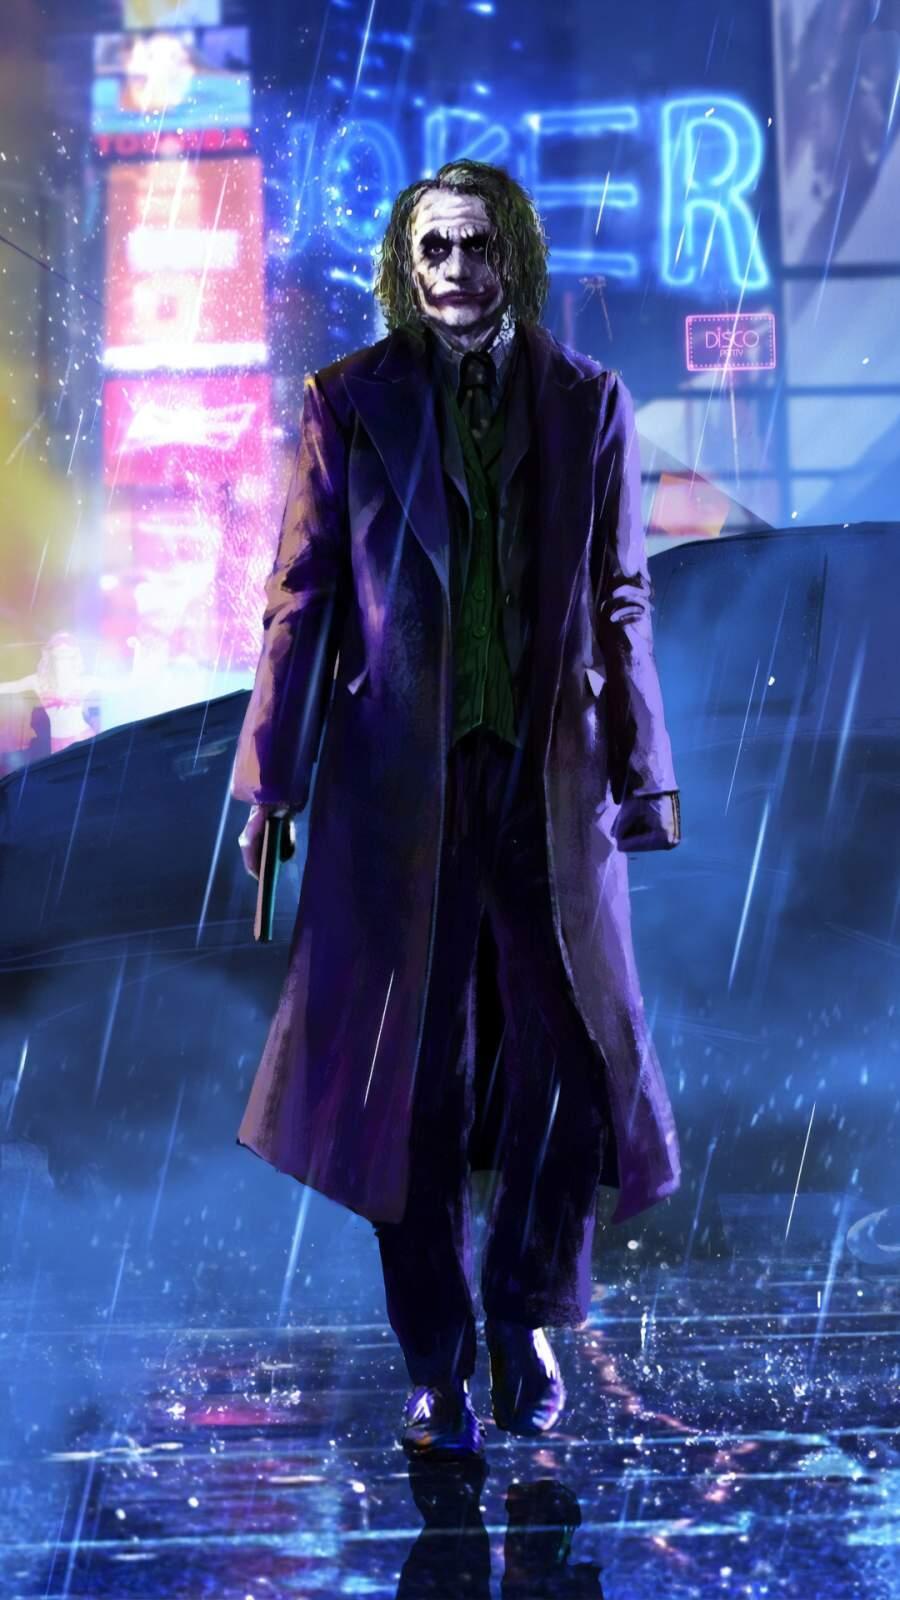 Joker in the Rain iPhone Wallpaper